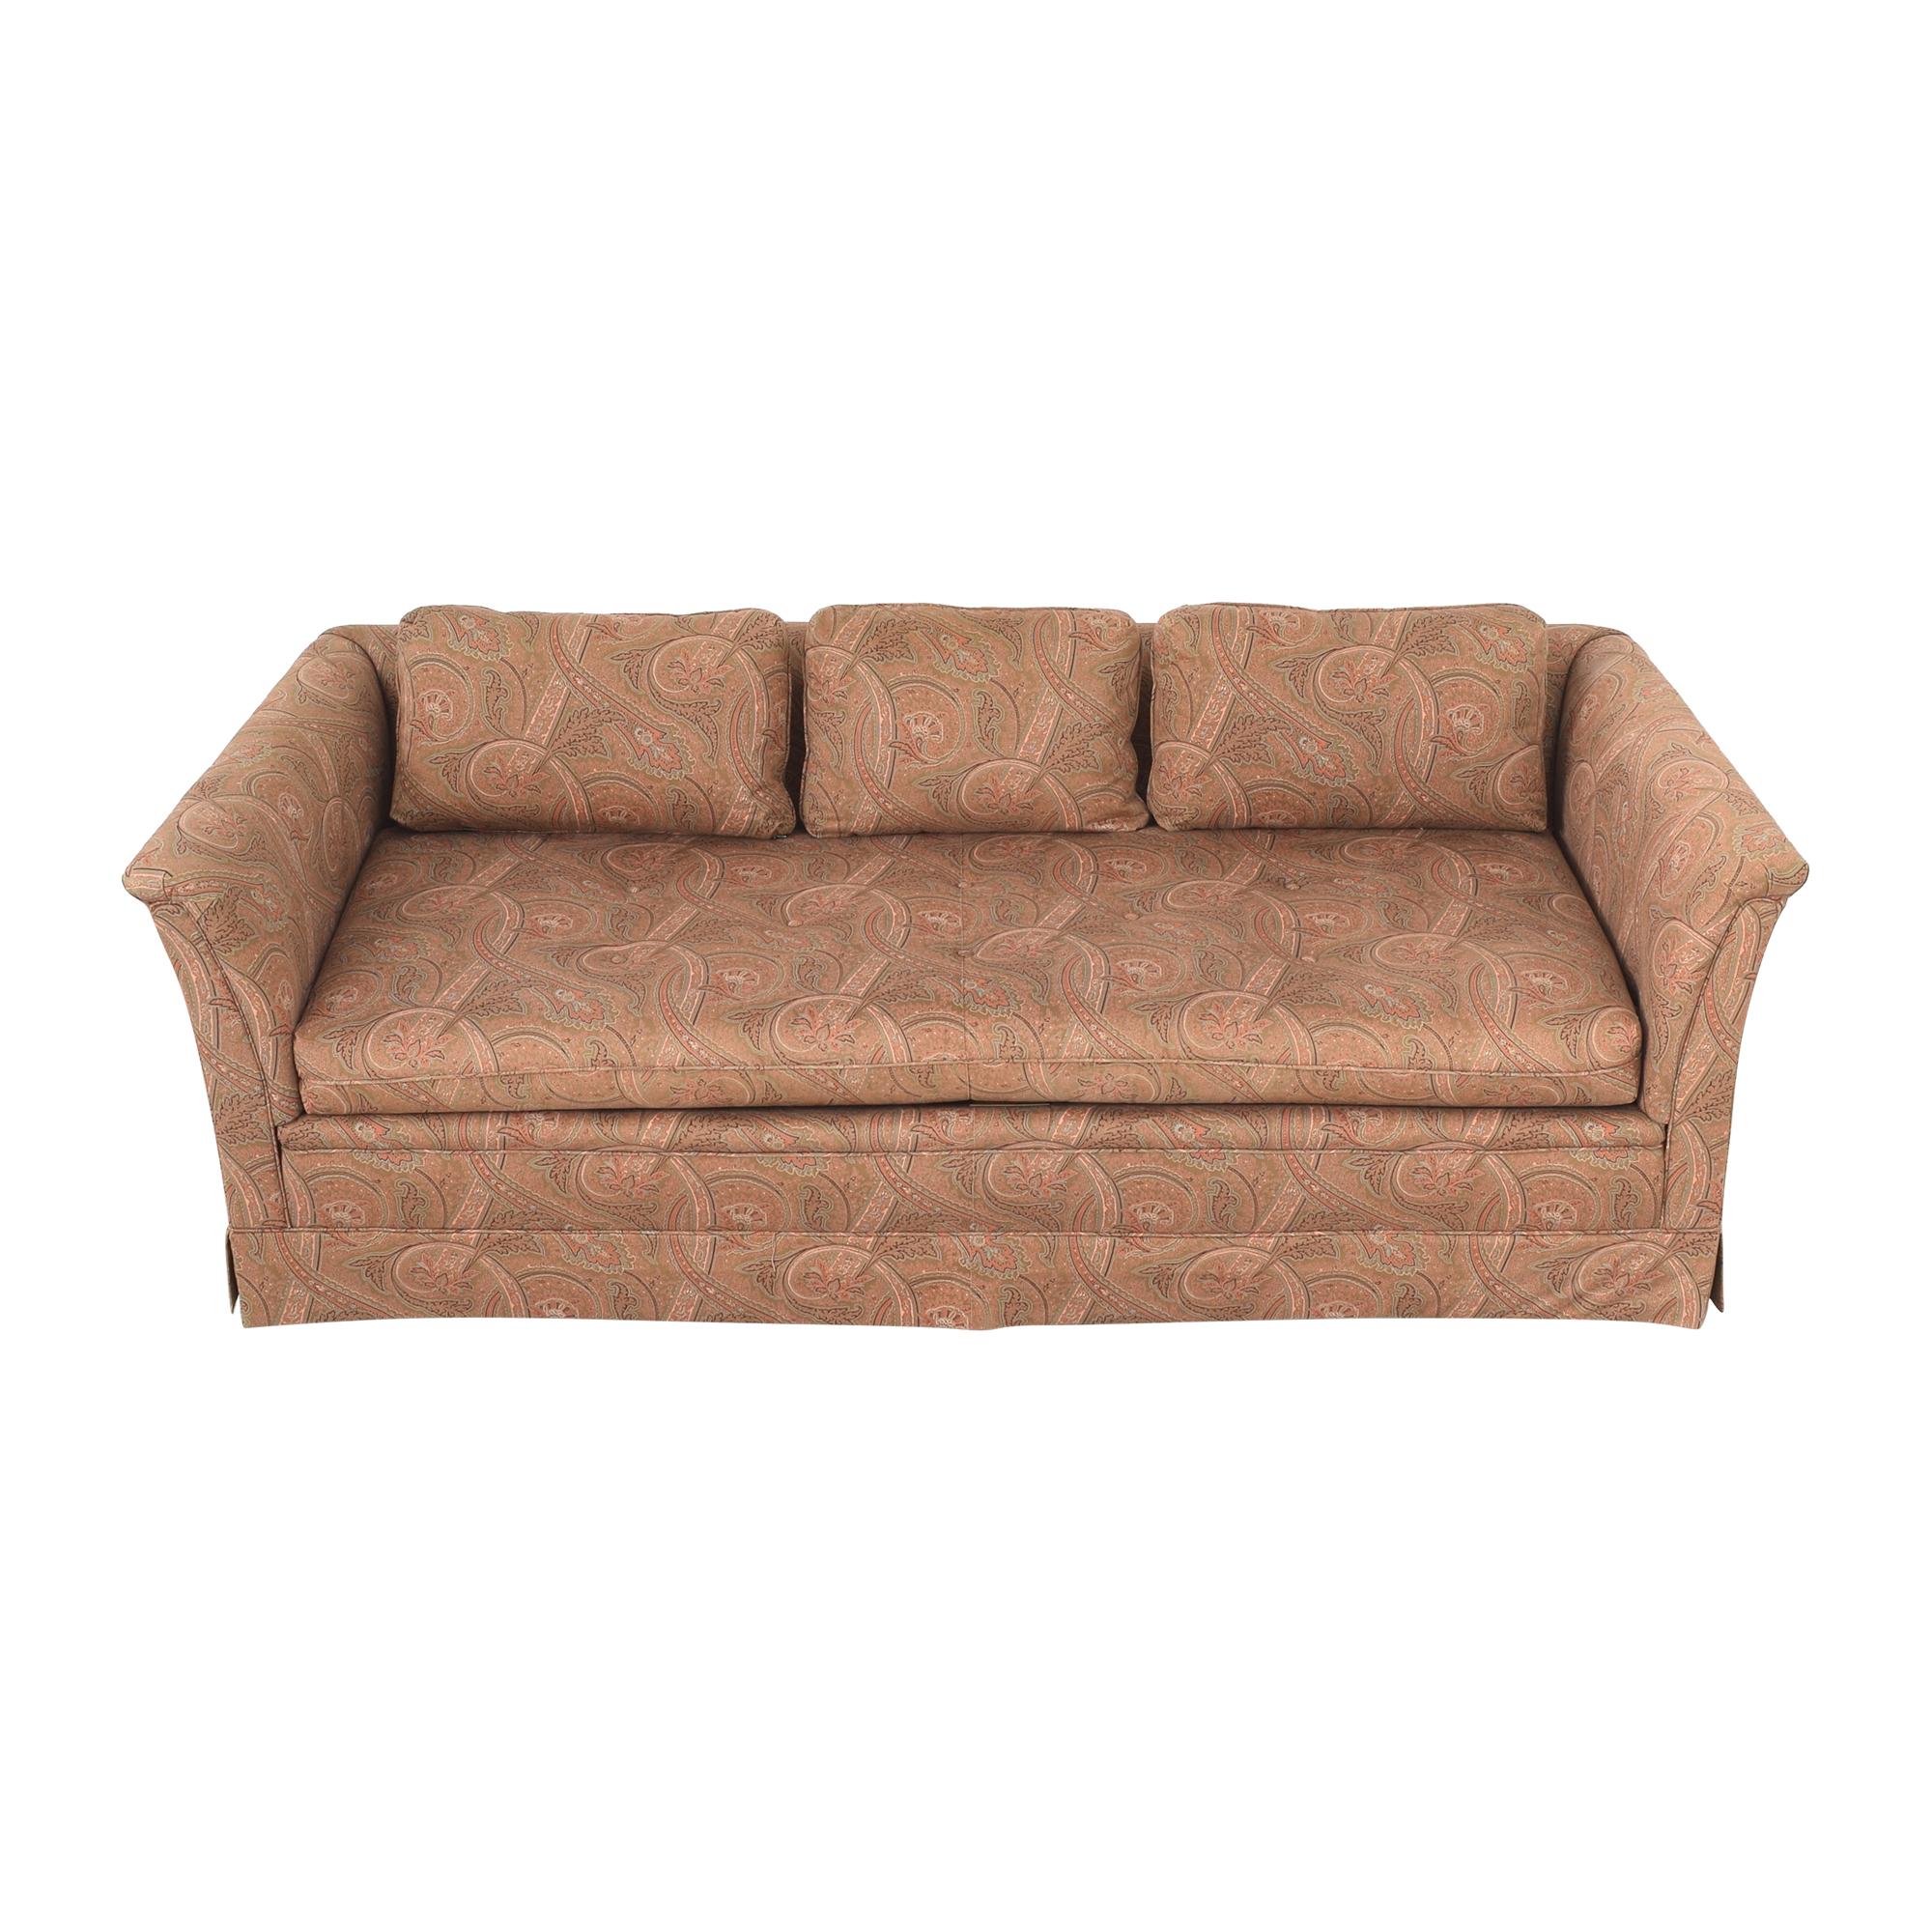 Bloomingdale's Bloomingdale's Paisley Bench Cushion Sofa used